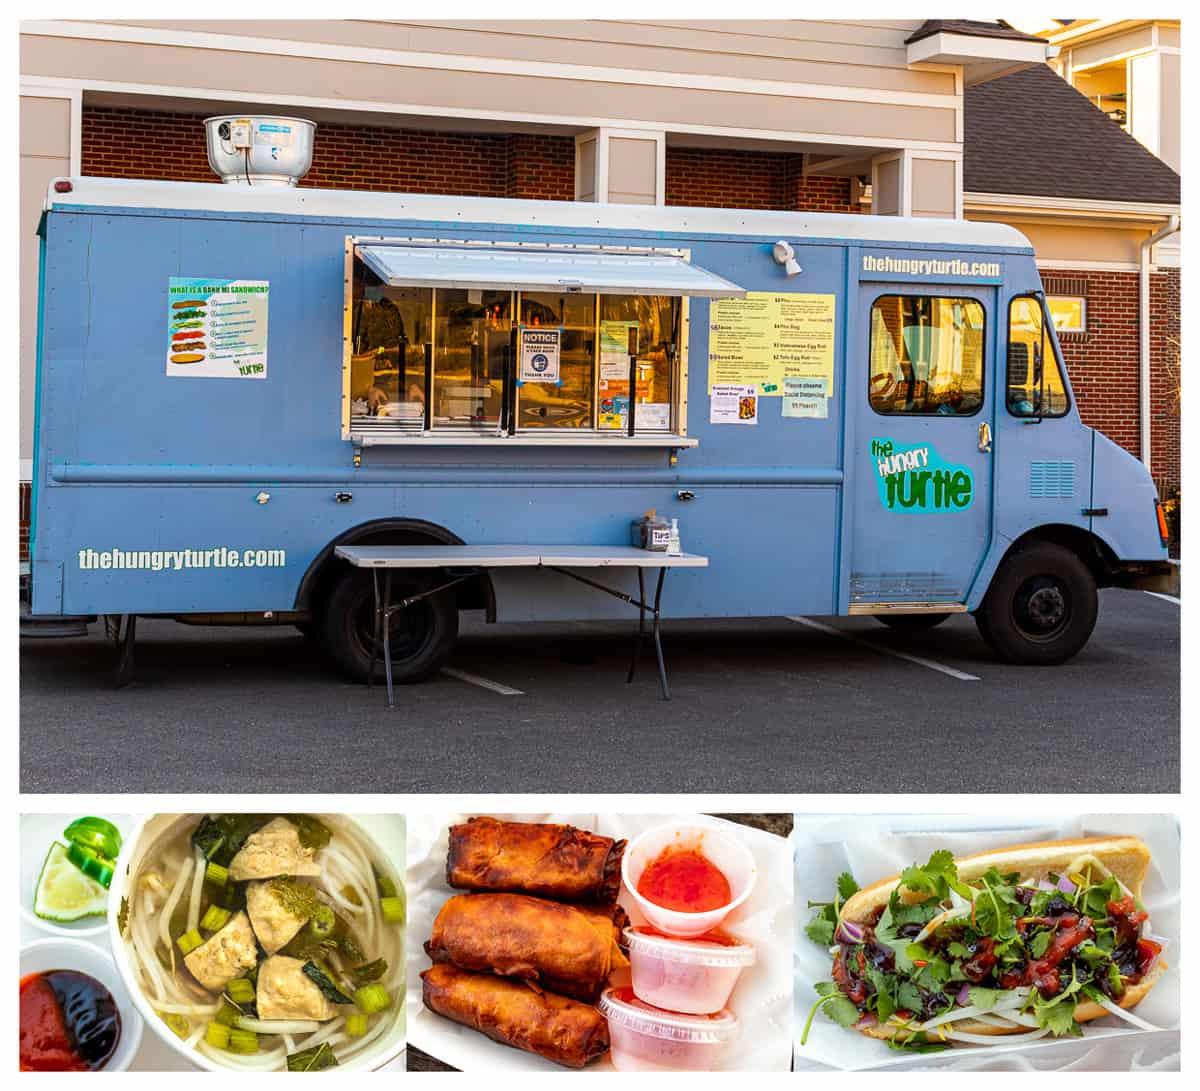 Richmond, VA food trucks: The Hungry Turtle food truck and menu items